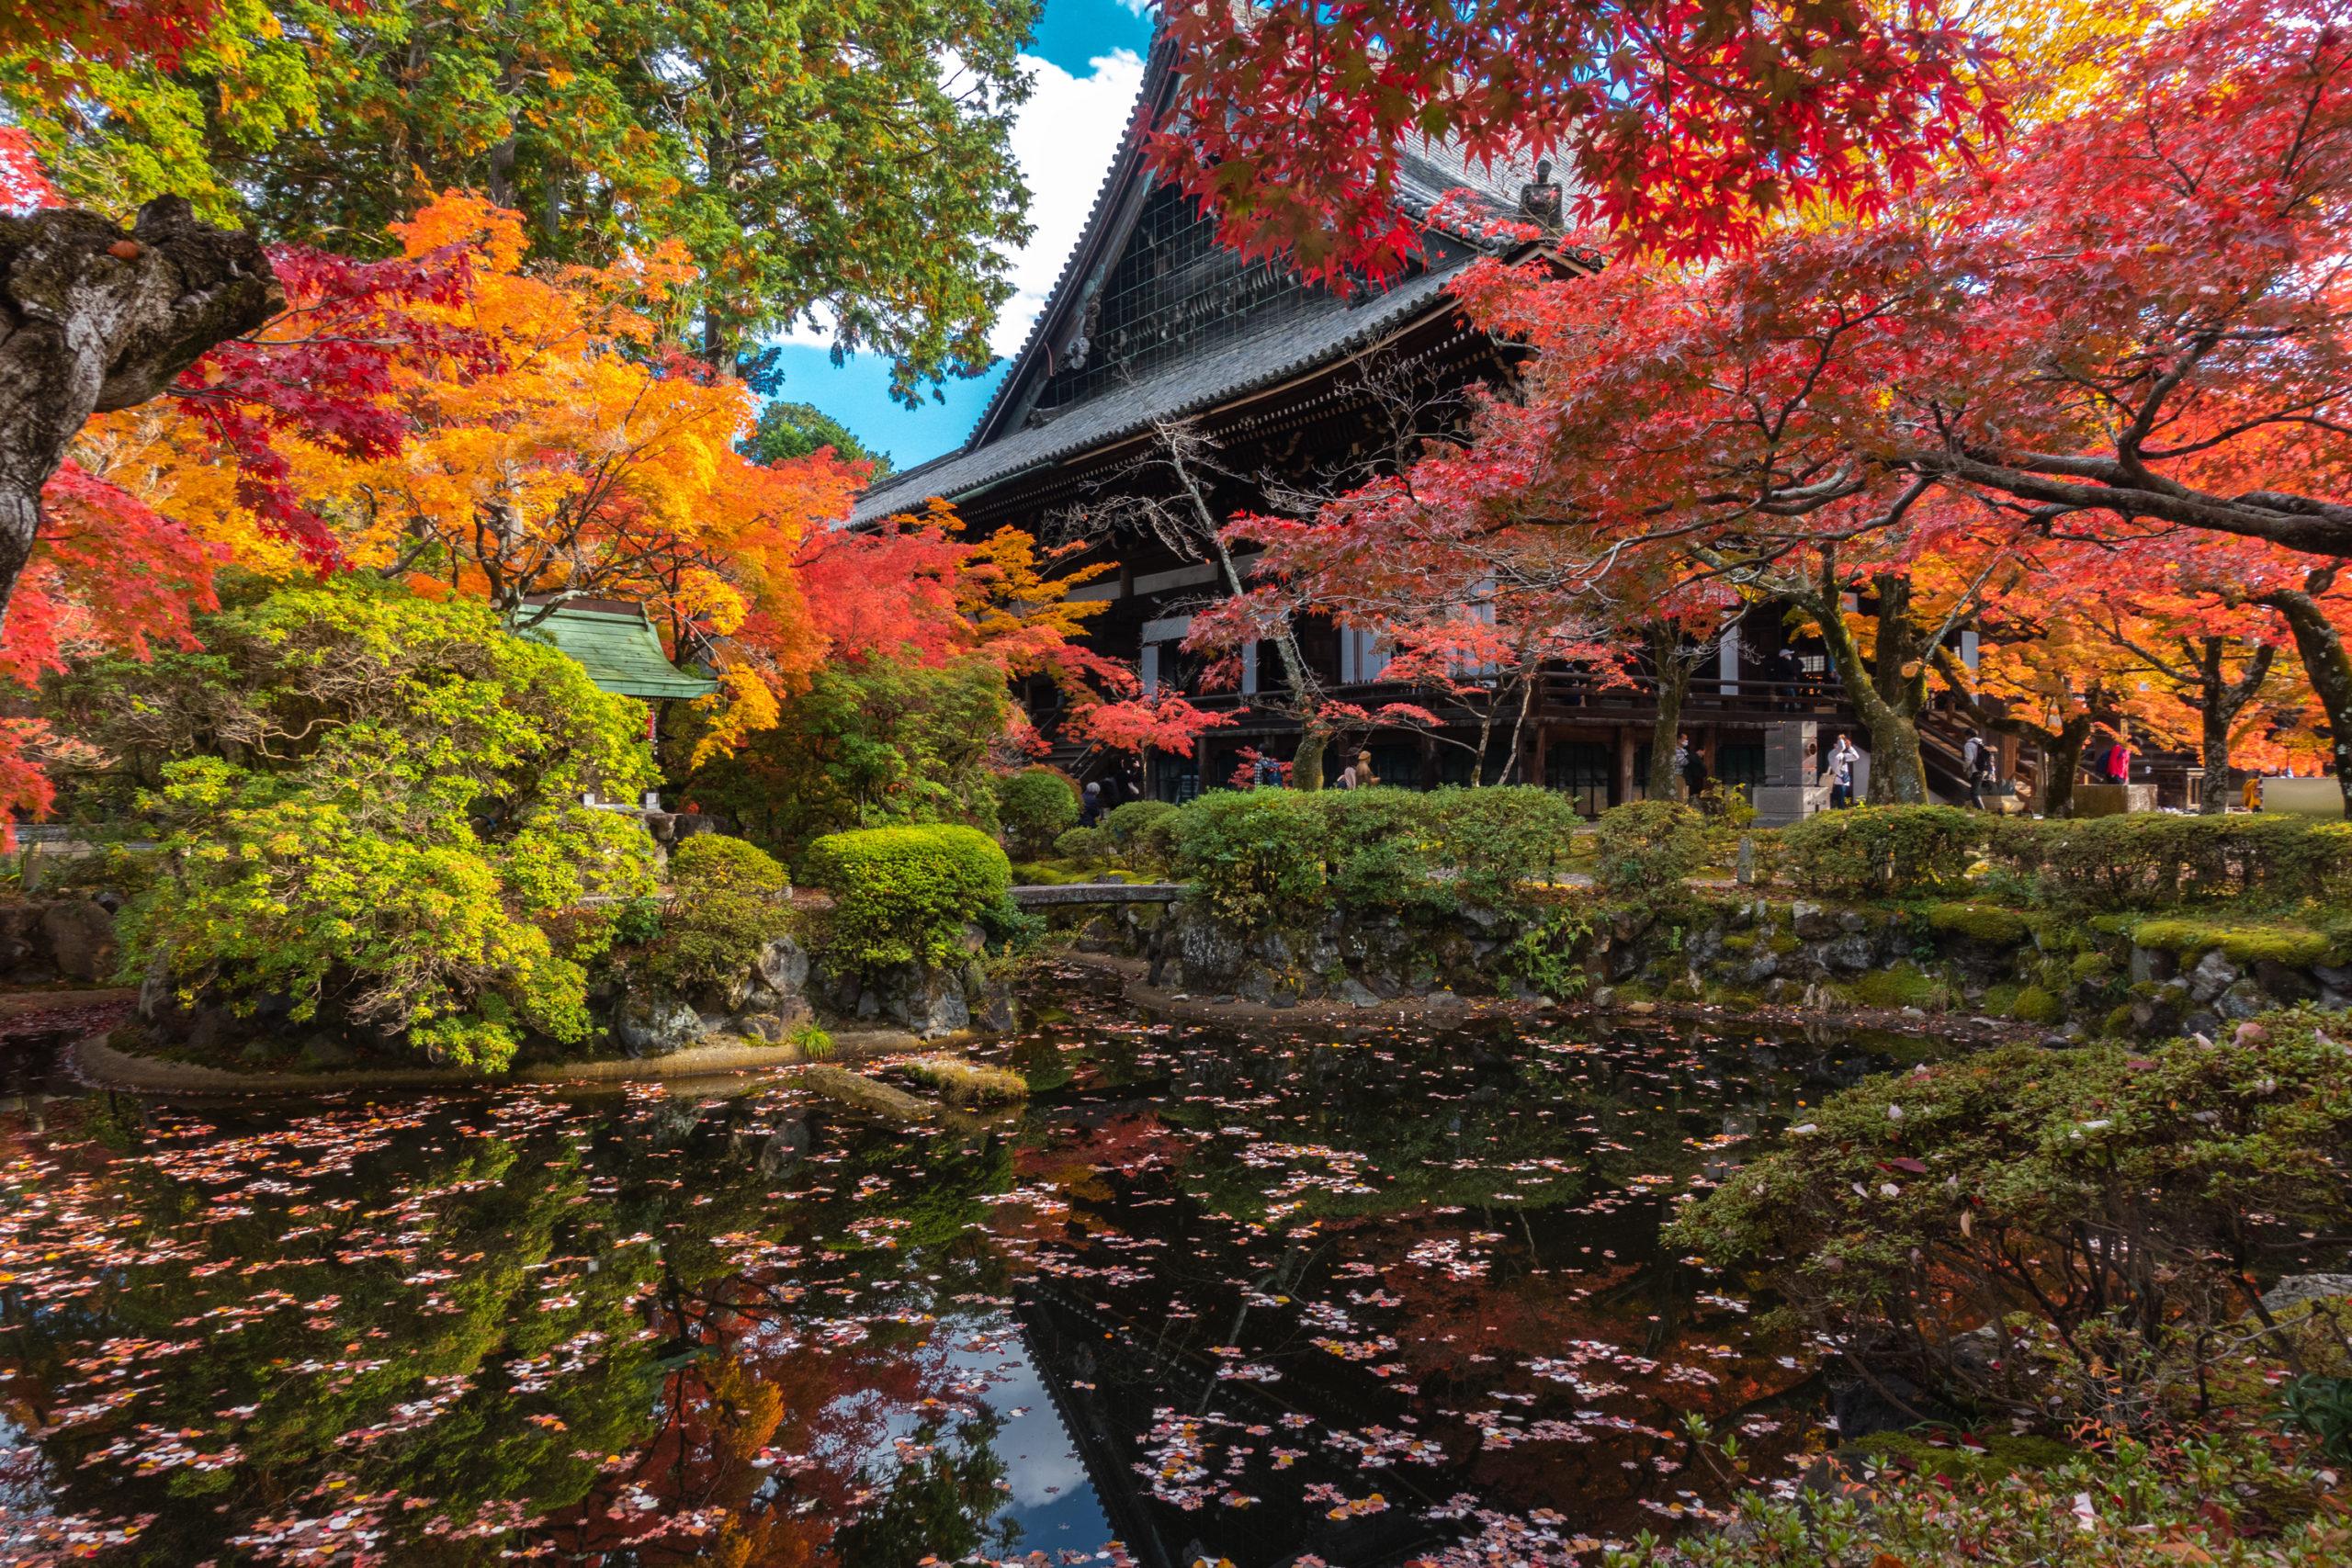 DSC00750-scaled 京都  真如堂(三重塔と紅葉の風情を感じる景色が美しい秋におすすめのスポット!撮影した写真の紹介、アクセス情報など)